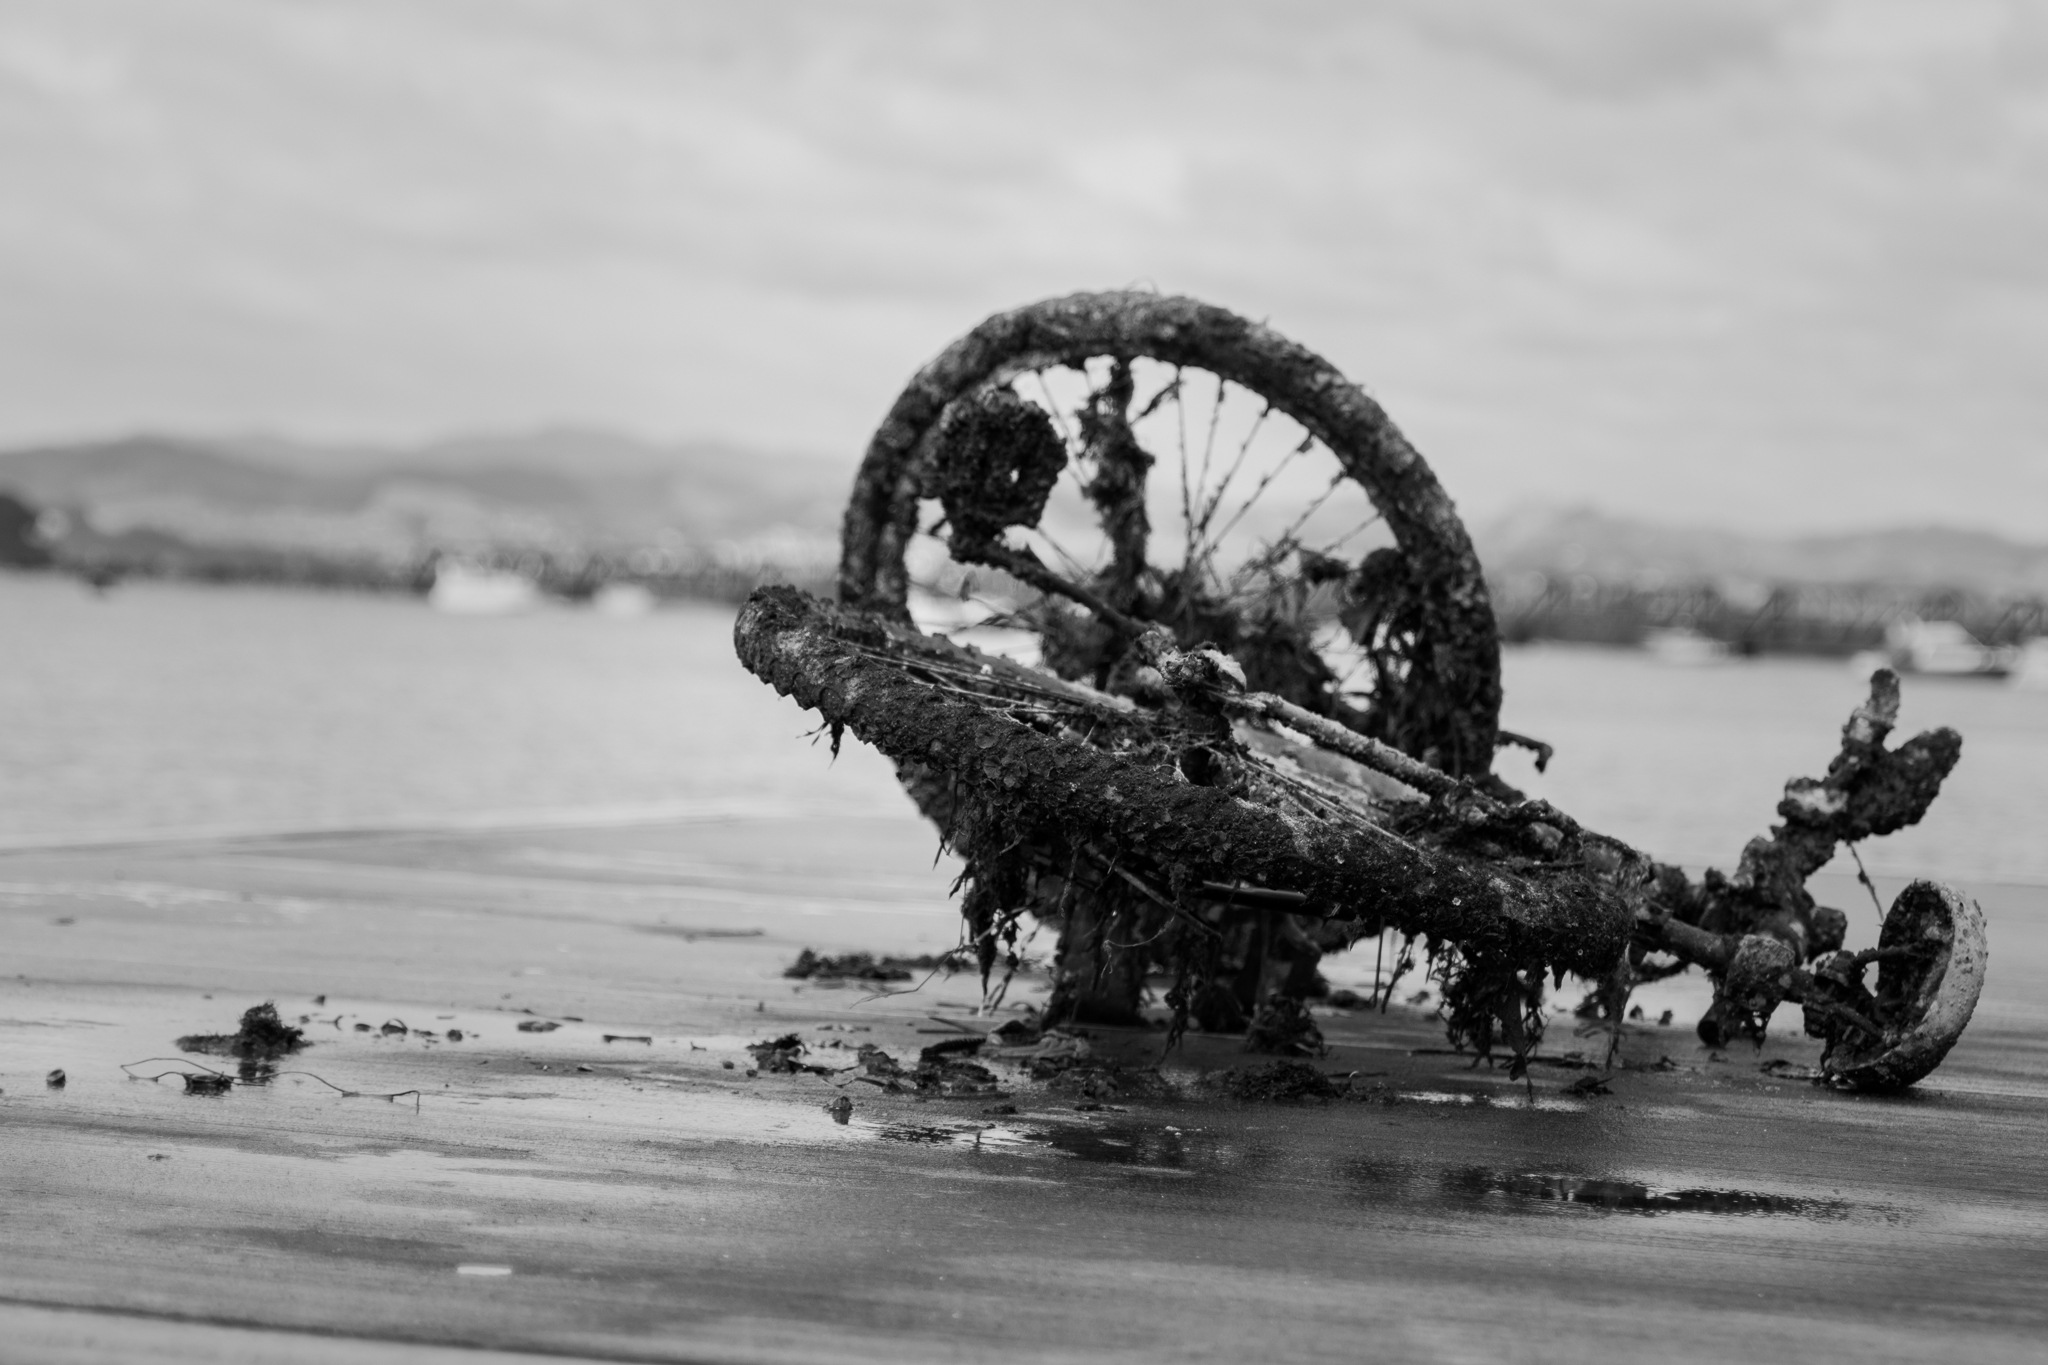 Untitled by Ilona Lace-Storey